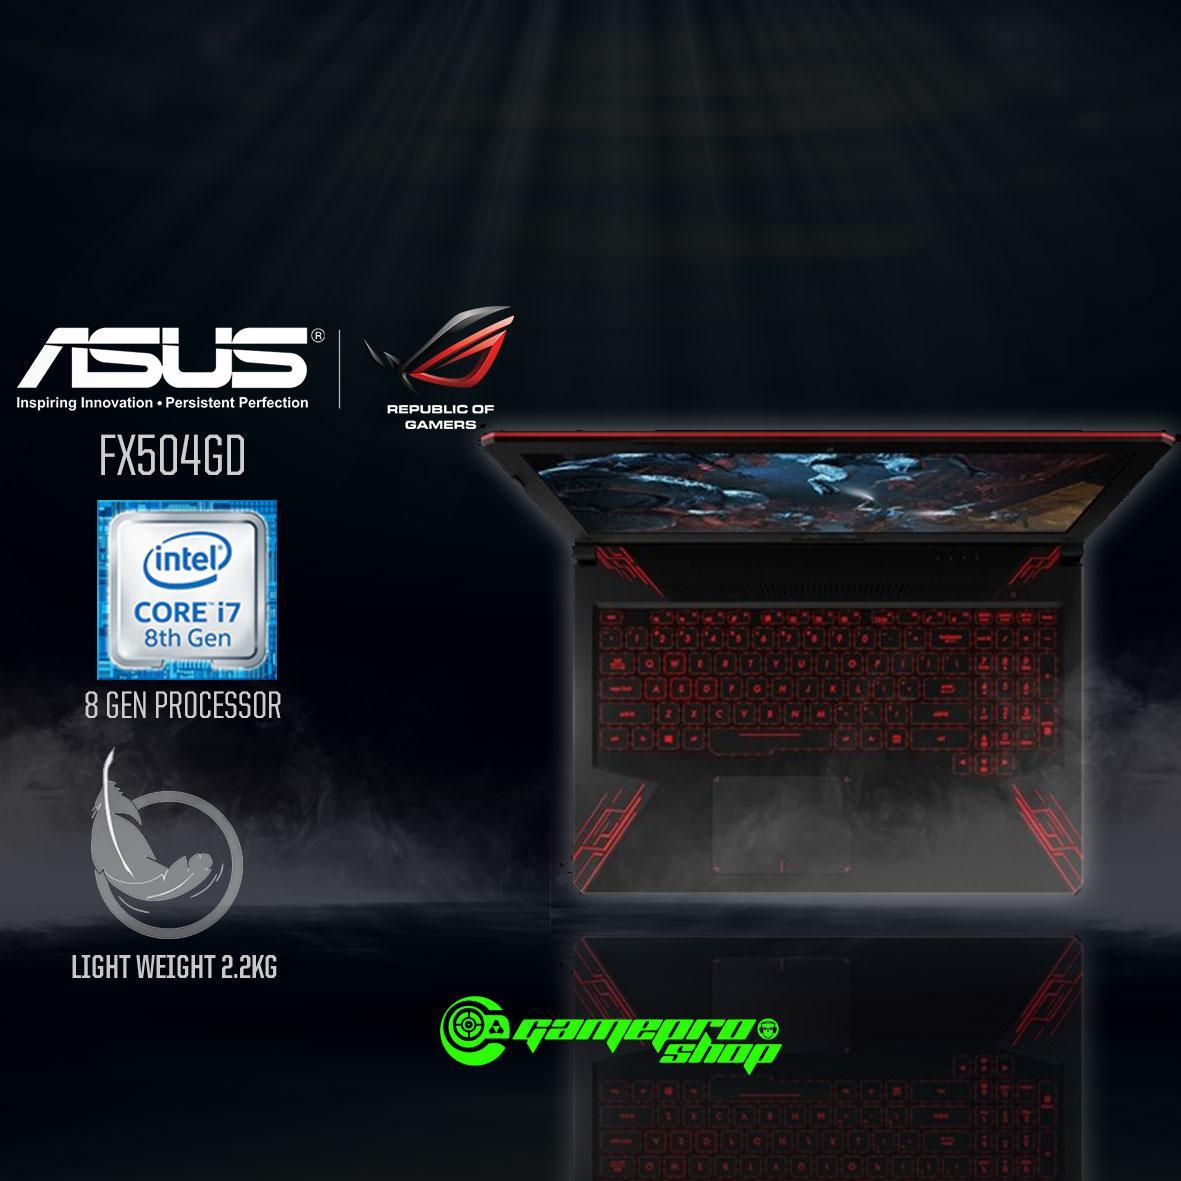 8th Gen ASUS FX504GD – E4335T (8th-Gen GTX1050 4GB GDDR5) 15.6″ Gaming Laptop *COMEX PROMO*